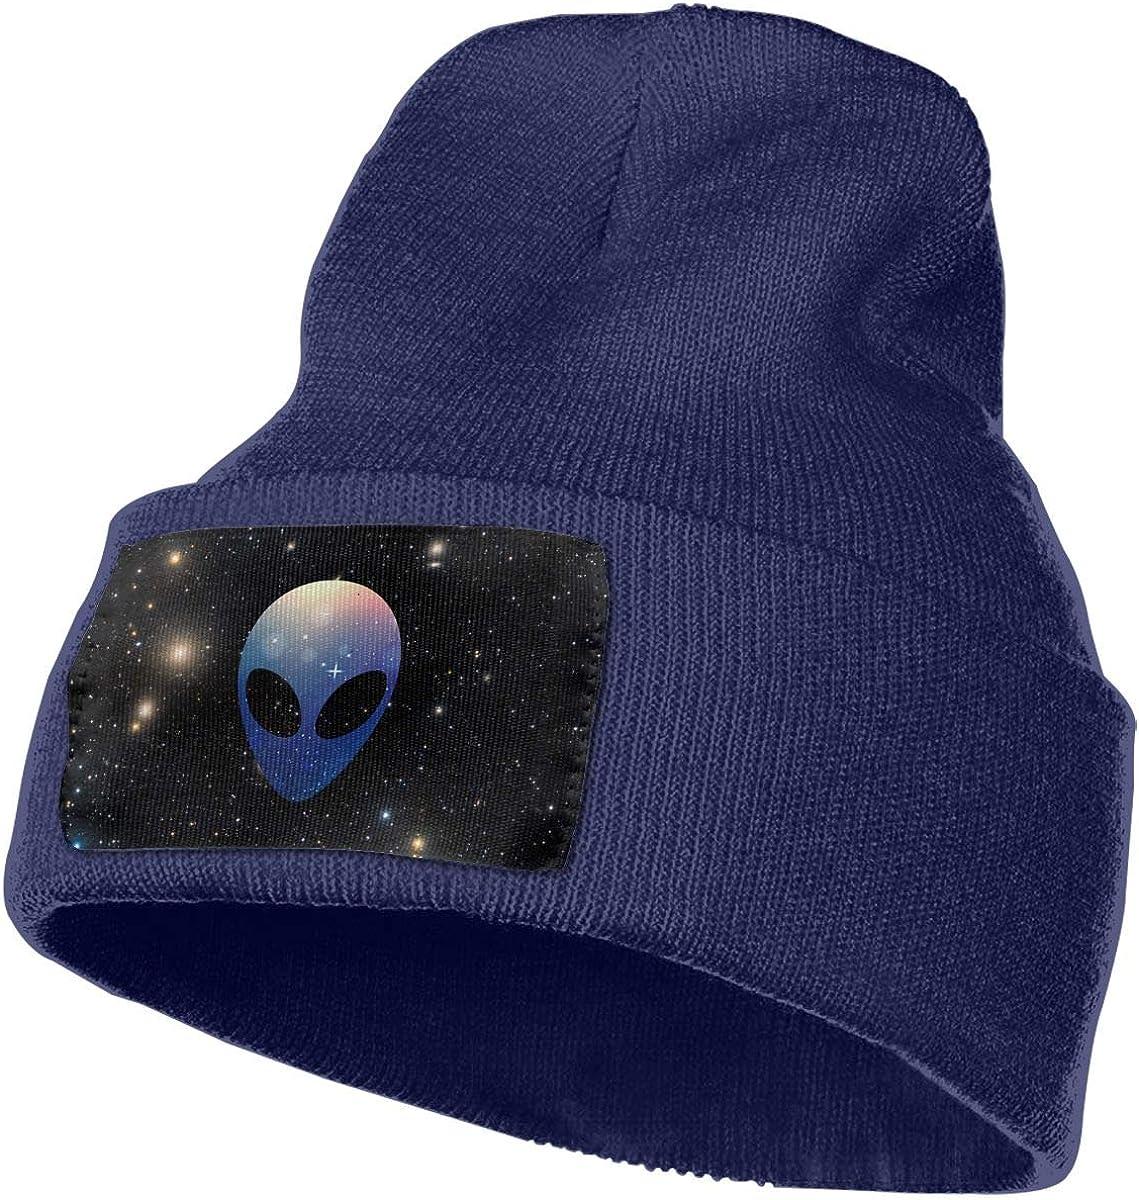 Space Alien Head Colorful Winter Beanie Hat Knit Skull Cap for for Men /& Women